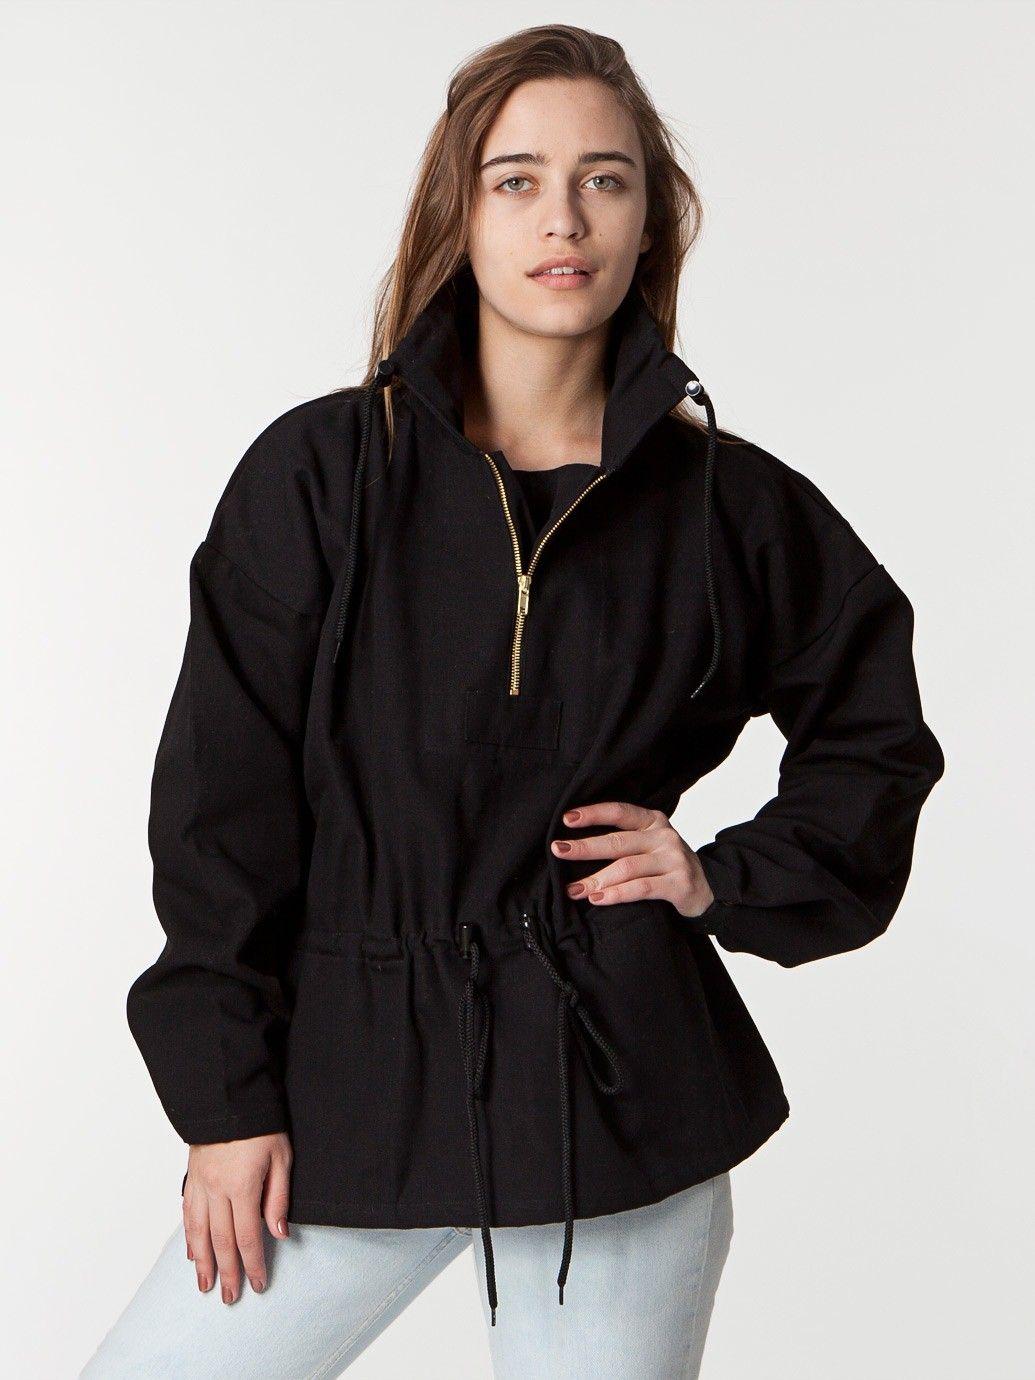 Unisex Pullover Jacket | Jackets & Blazers | Women's Outerwear ...